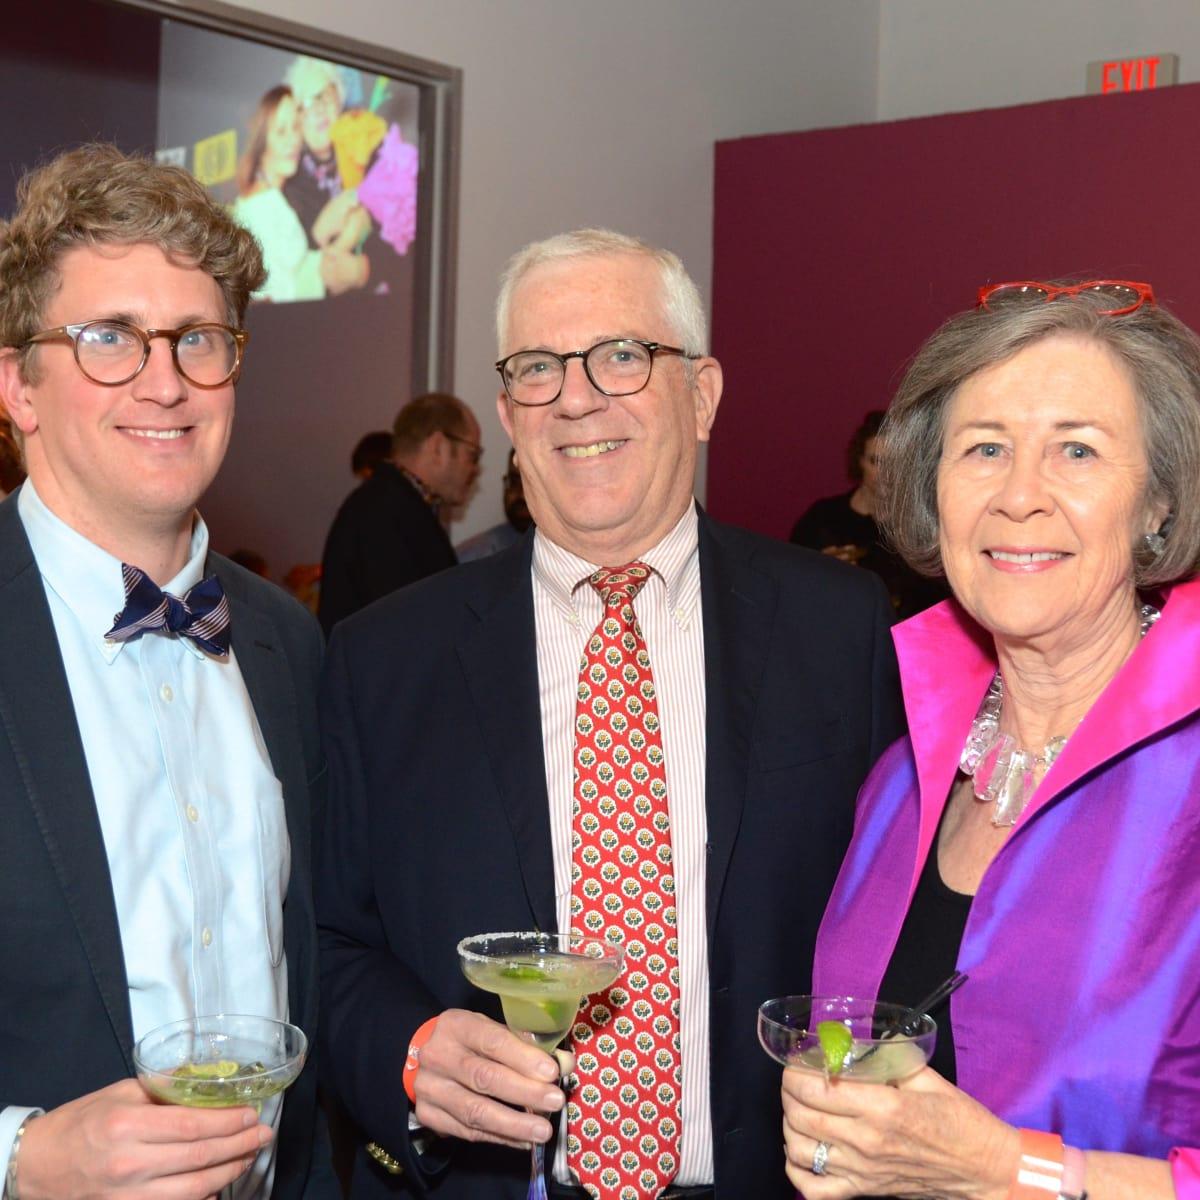 Center for Contemporary Craft, Margarita Madness, Jan. 2016, Perry Price, Richard Rabinow, Kathryn Rabinow